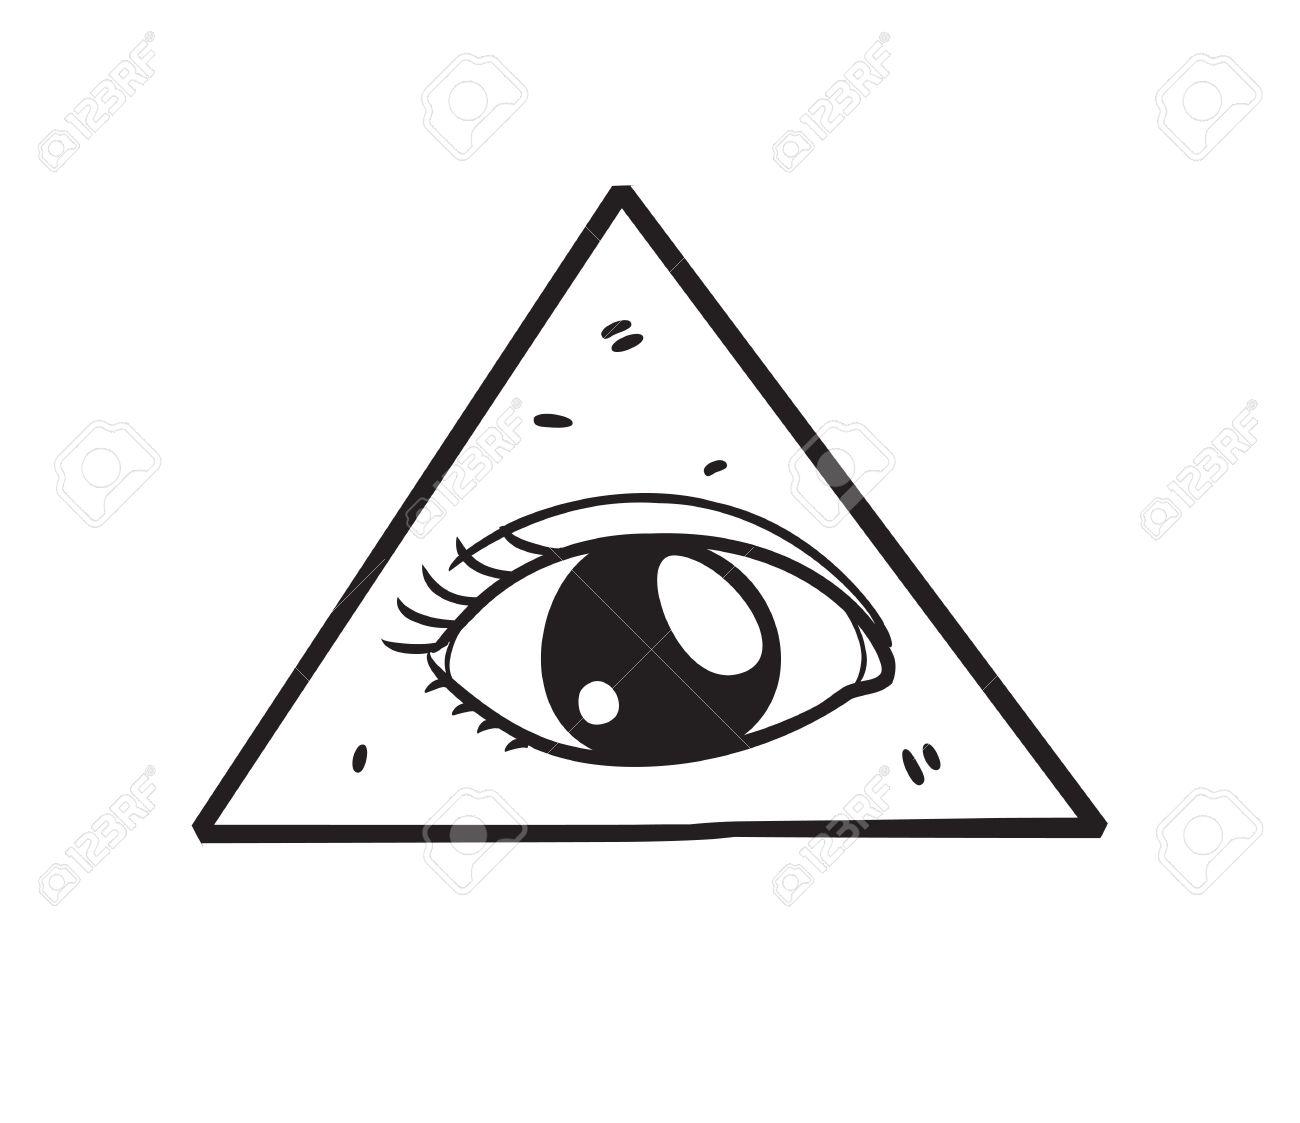 Illuminati clipart #7, Download drawings